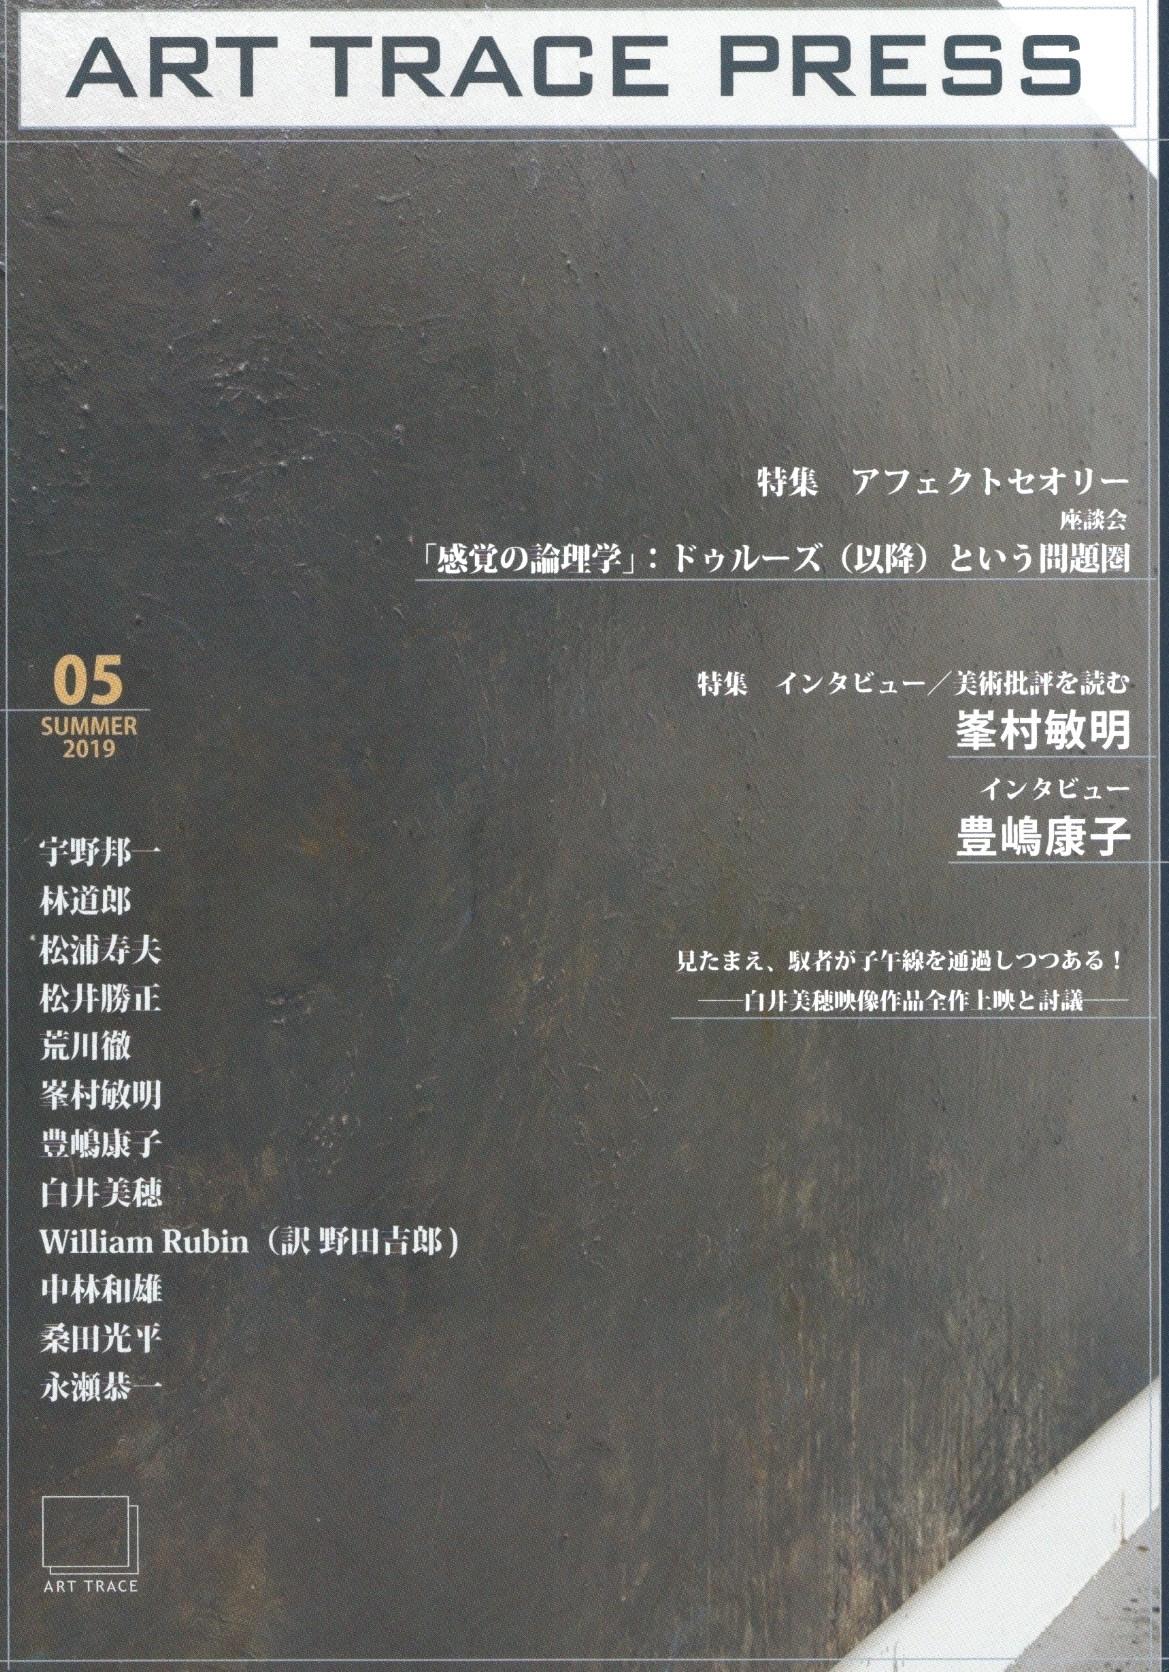 ART TRACE PRESS 05 アフェクト・セオリー